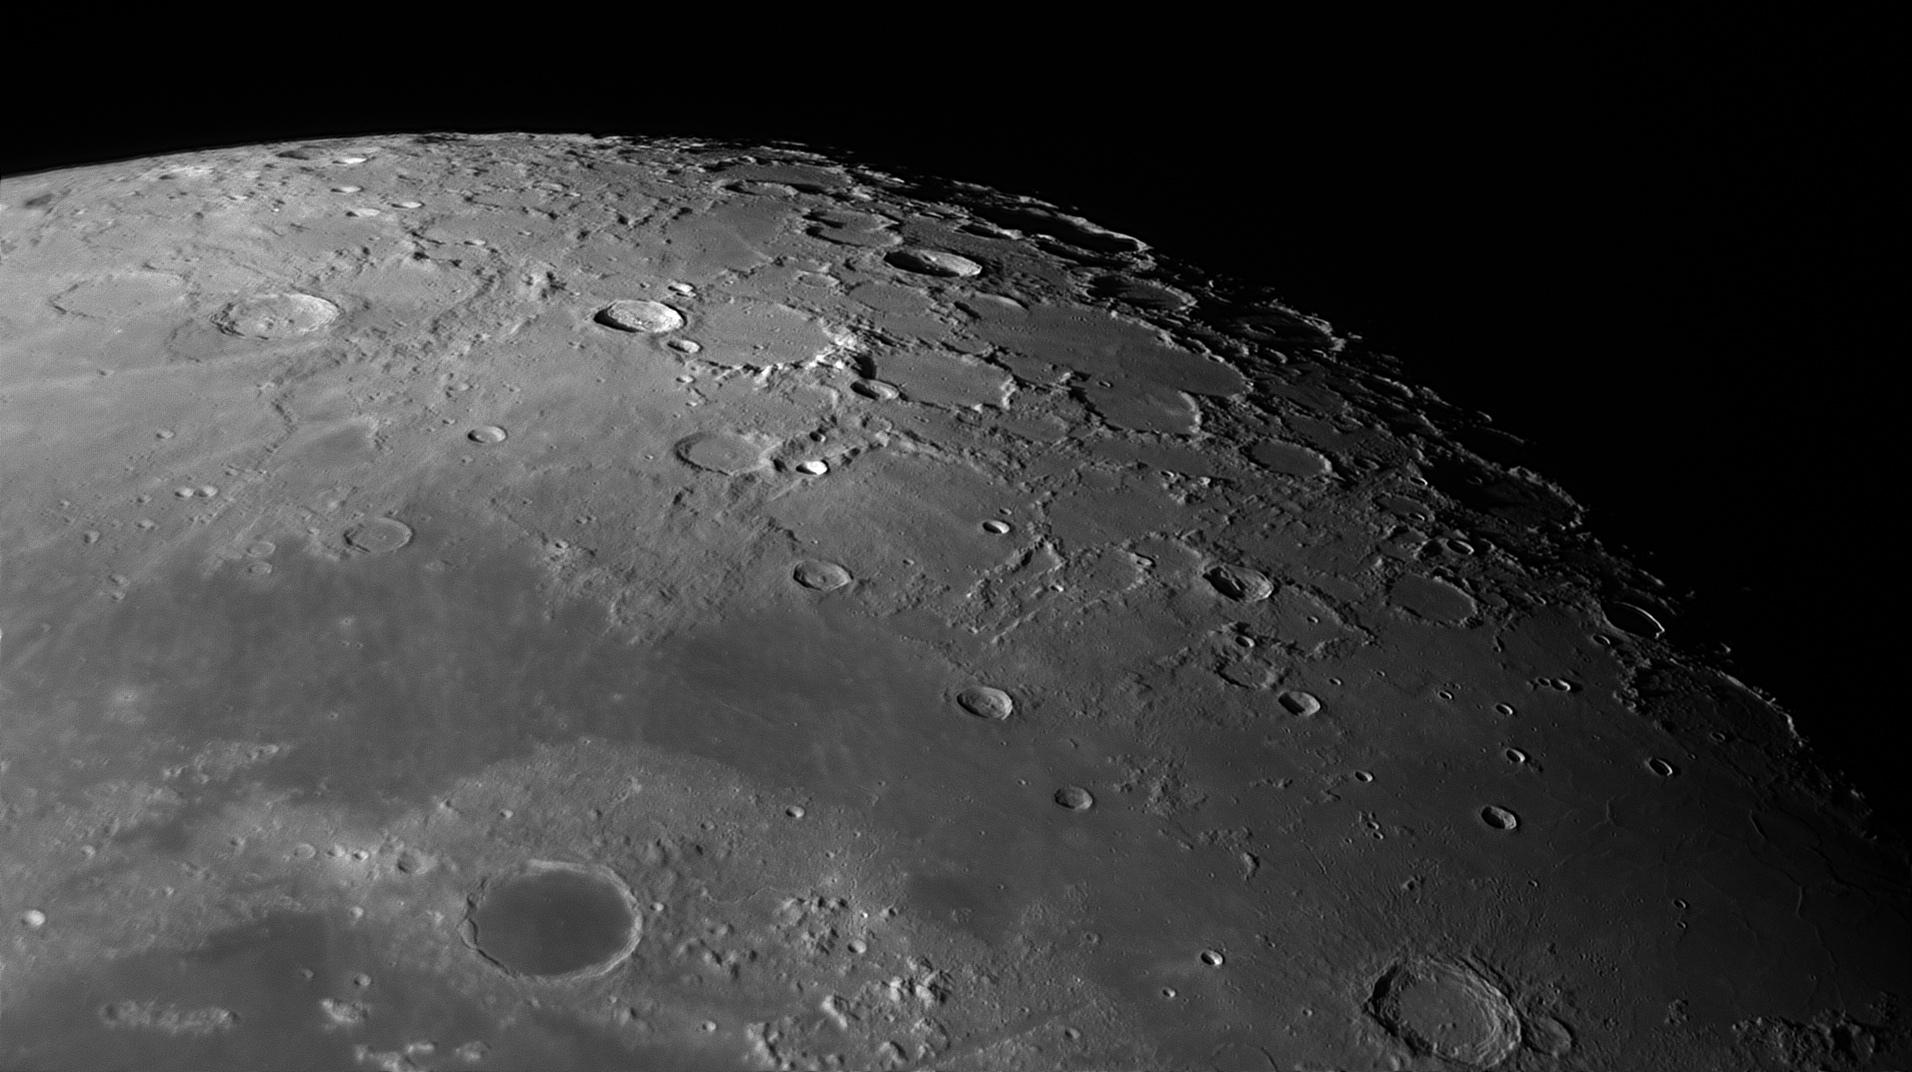 5daa1d2751c22_Moon_054840_181019_ZWOASI290MM_Rouge_23A_AS_P40_lapl4_ap350ast.jpg.3722bafed3d8575c9a6d7569f9110825.jpg